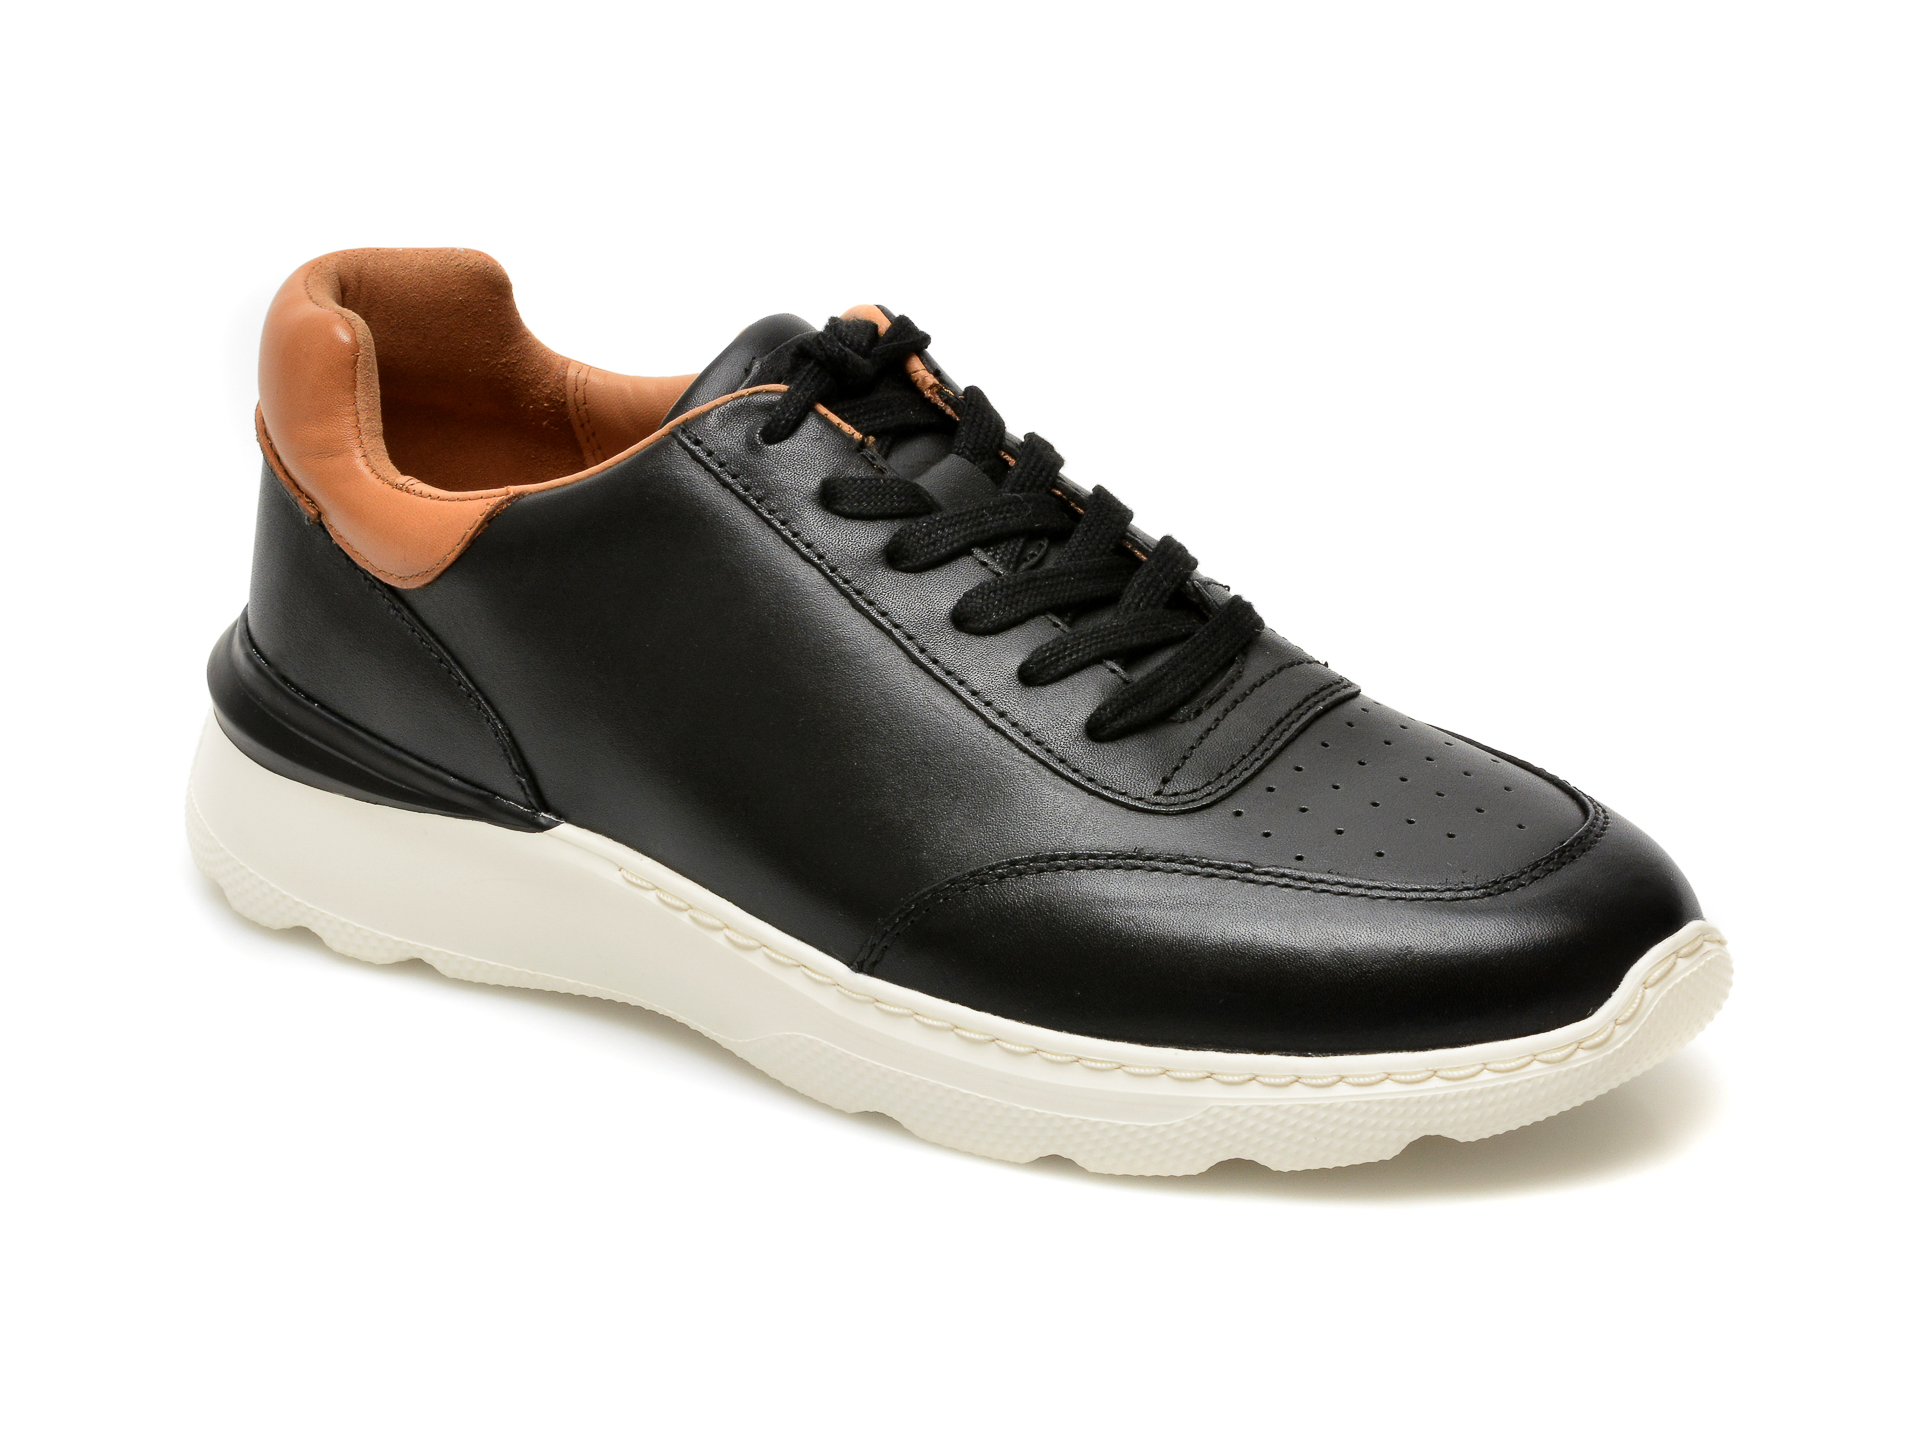 Pantofi CLARKS negri, Sprintlitelace, din piele naturala imagine